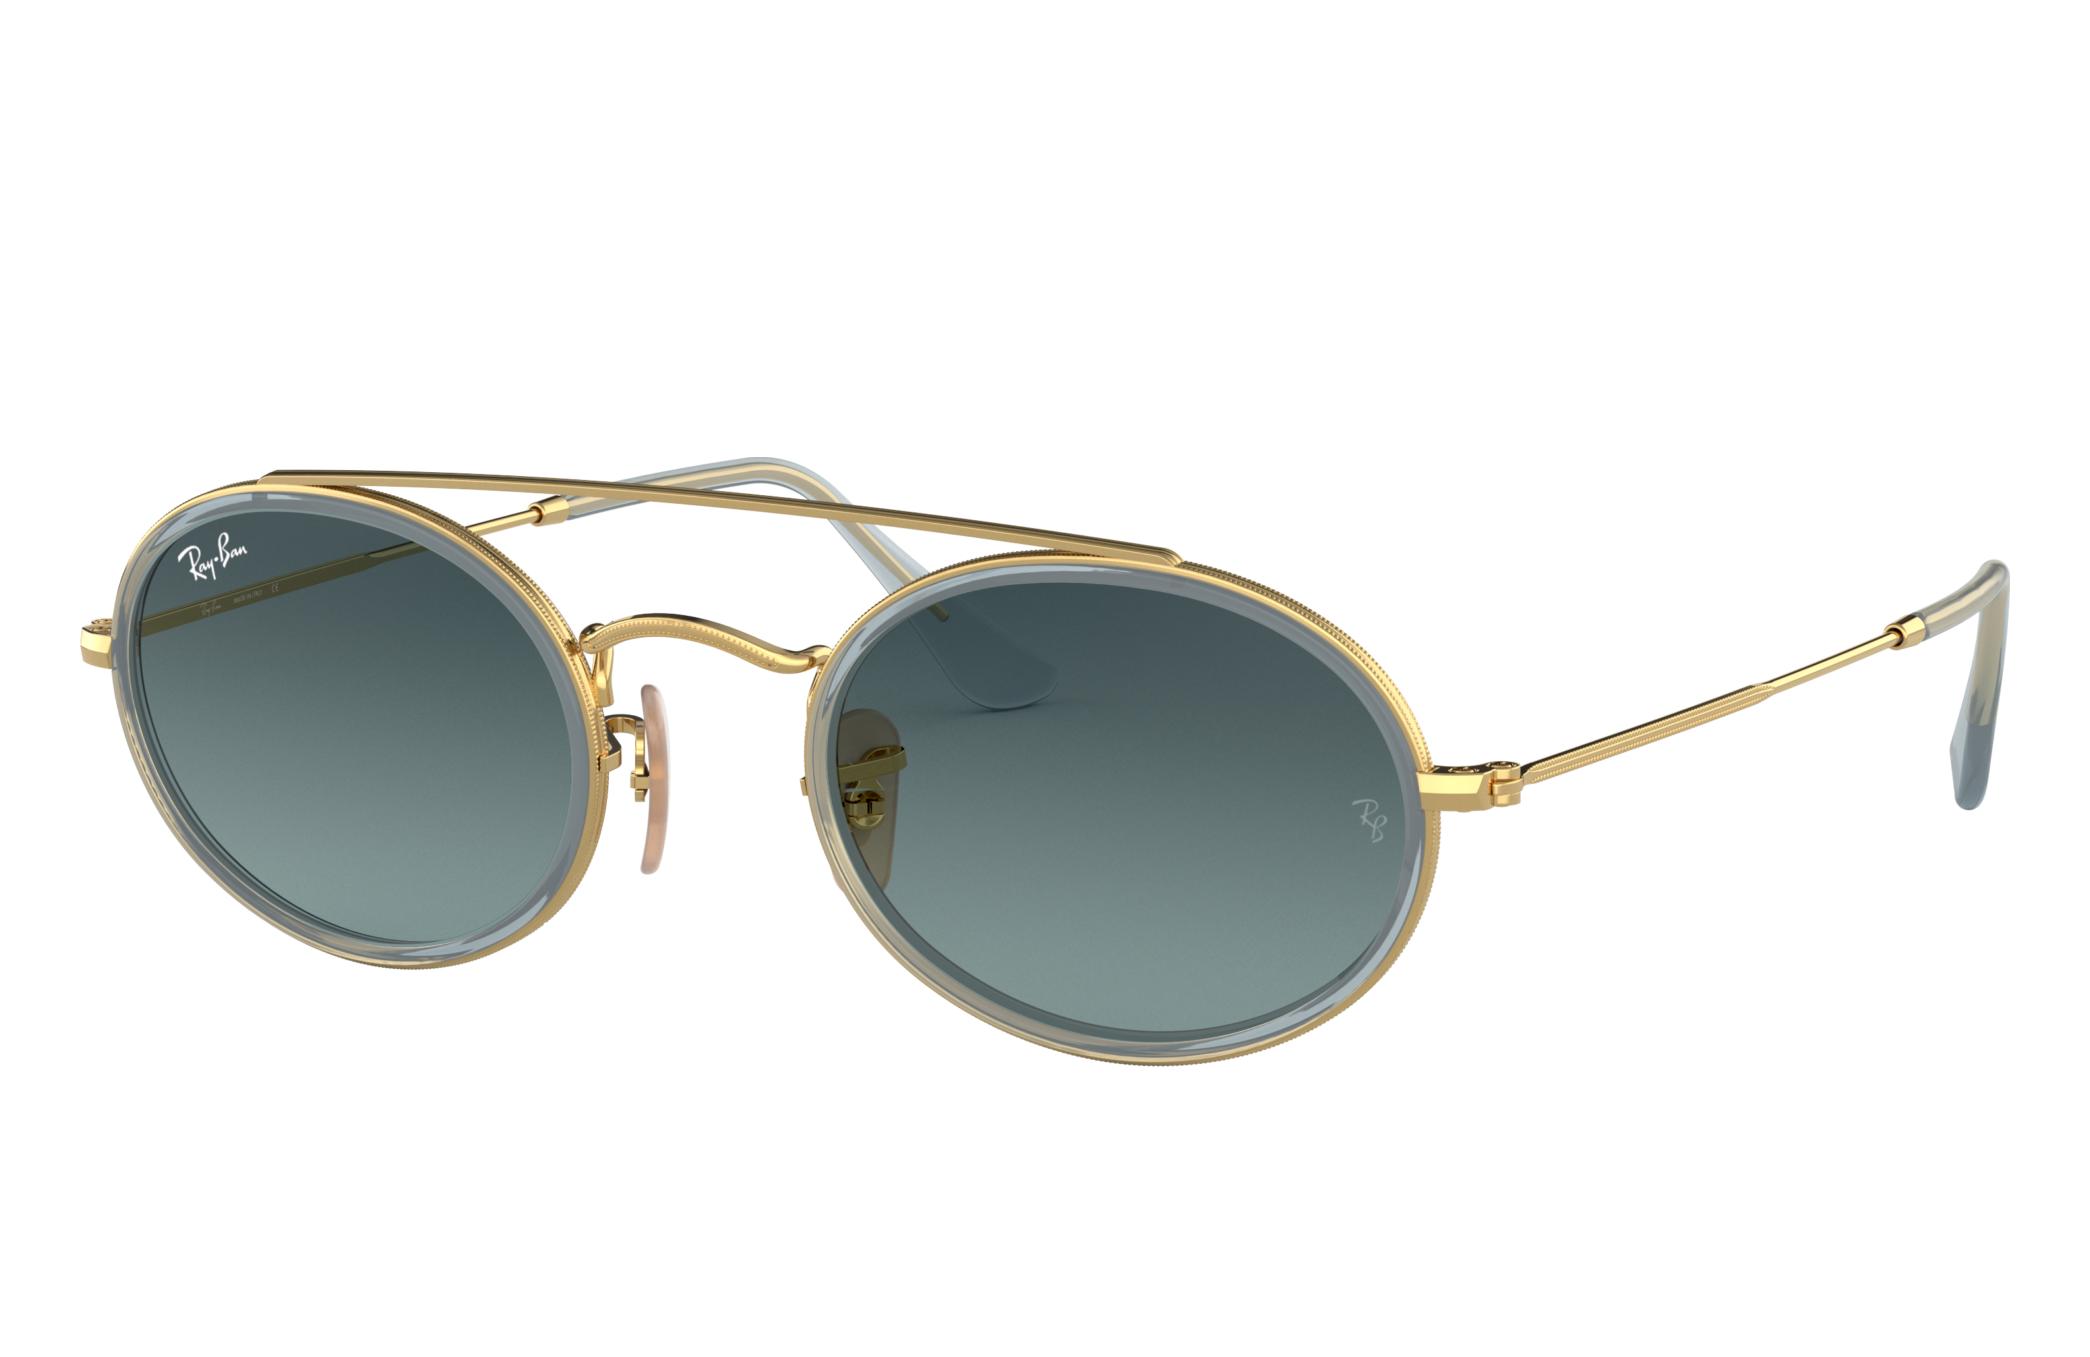 Ray-Ban Oval Double Bridge Gold, Blue Lenses - RB3847N